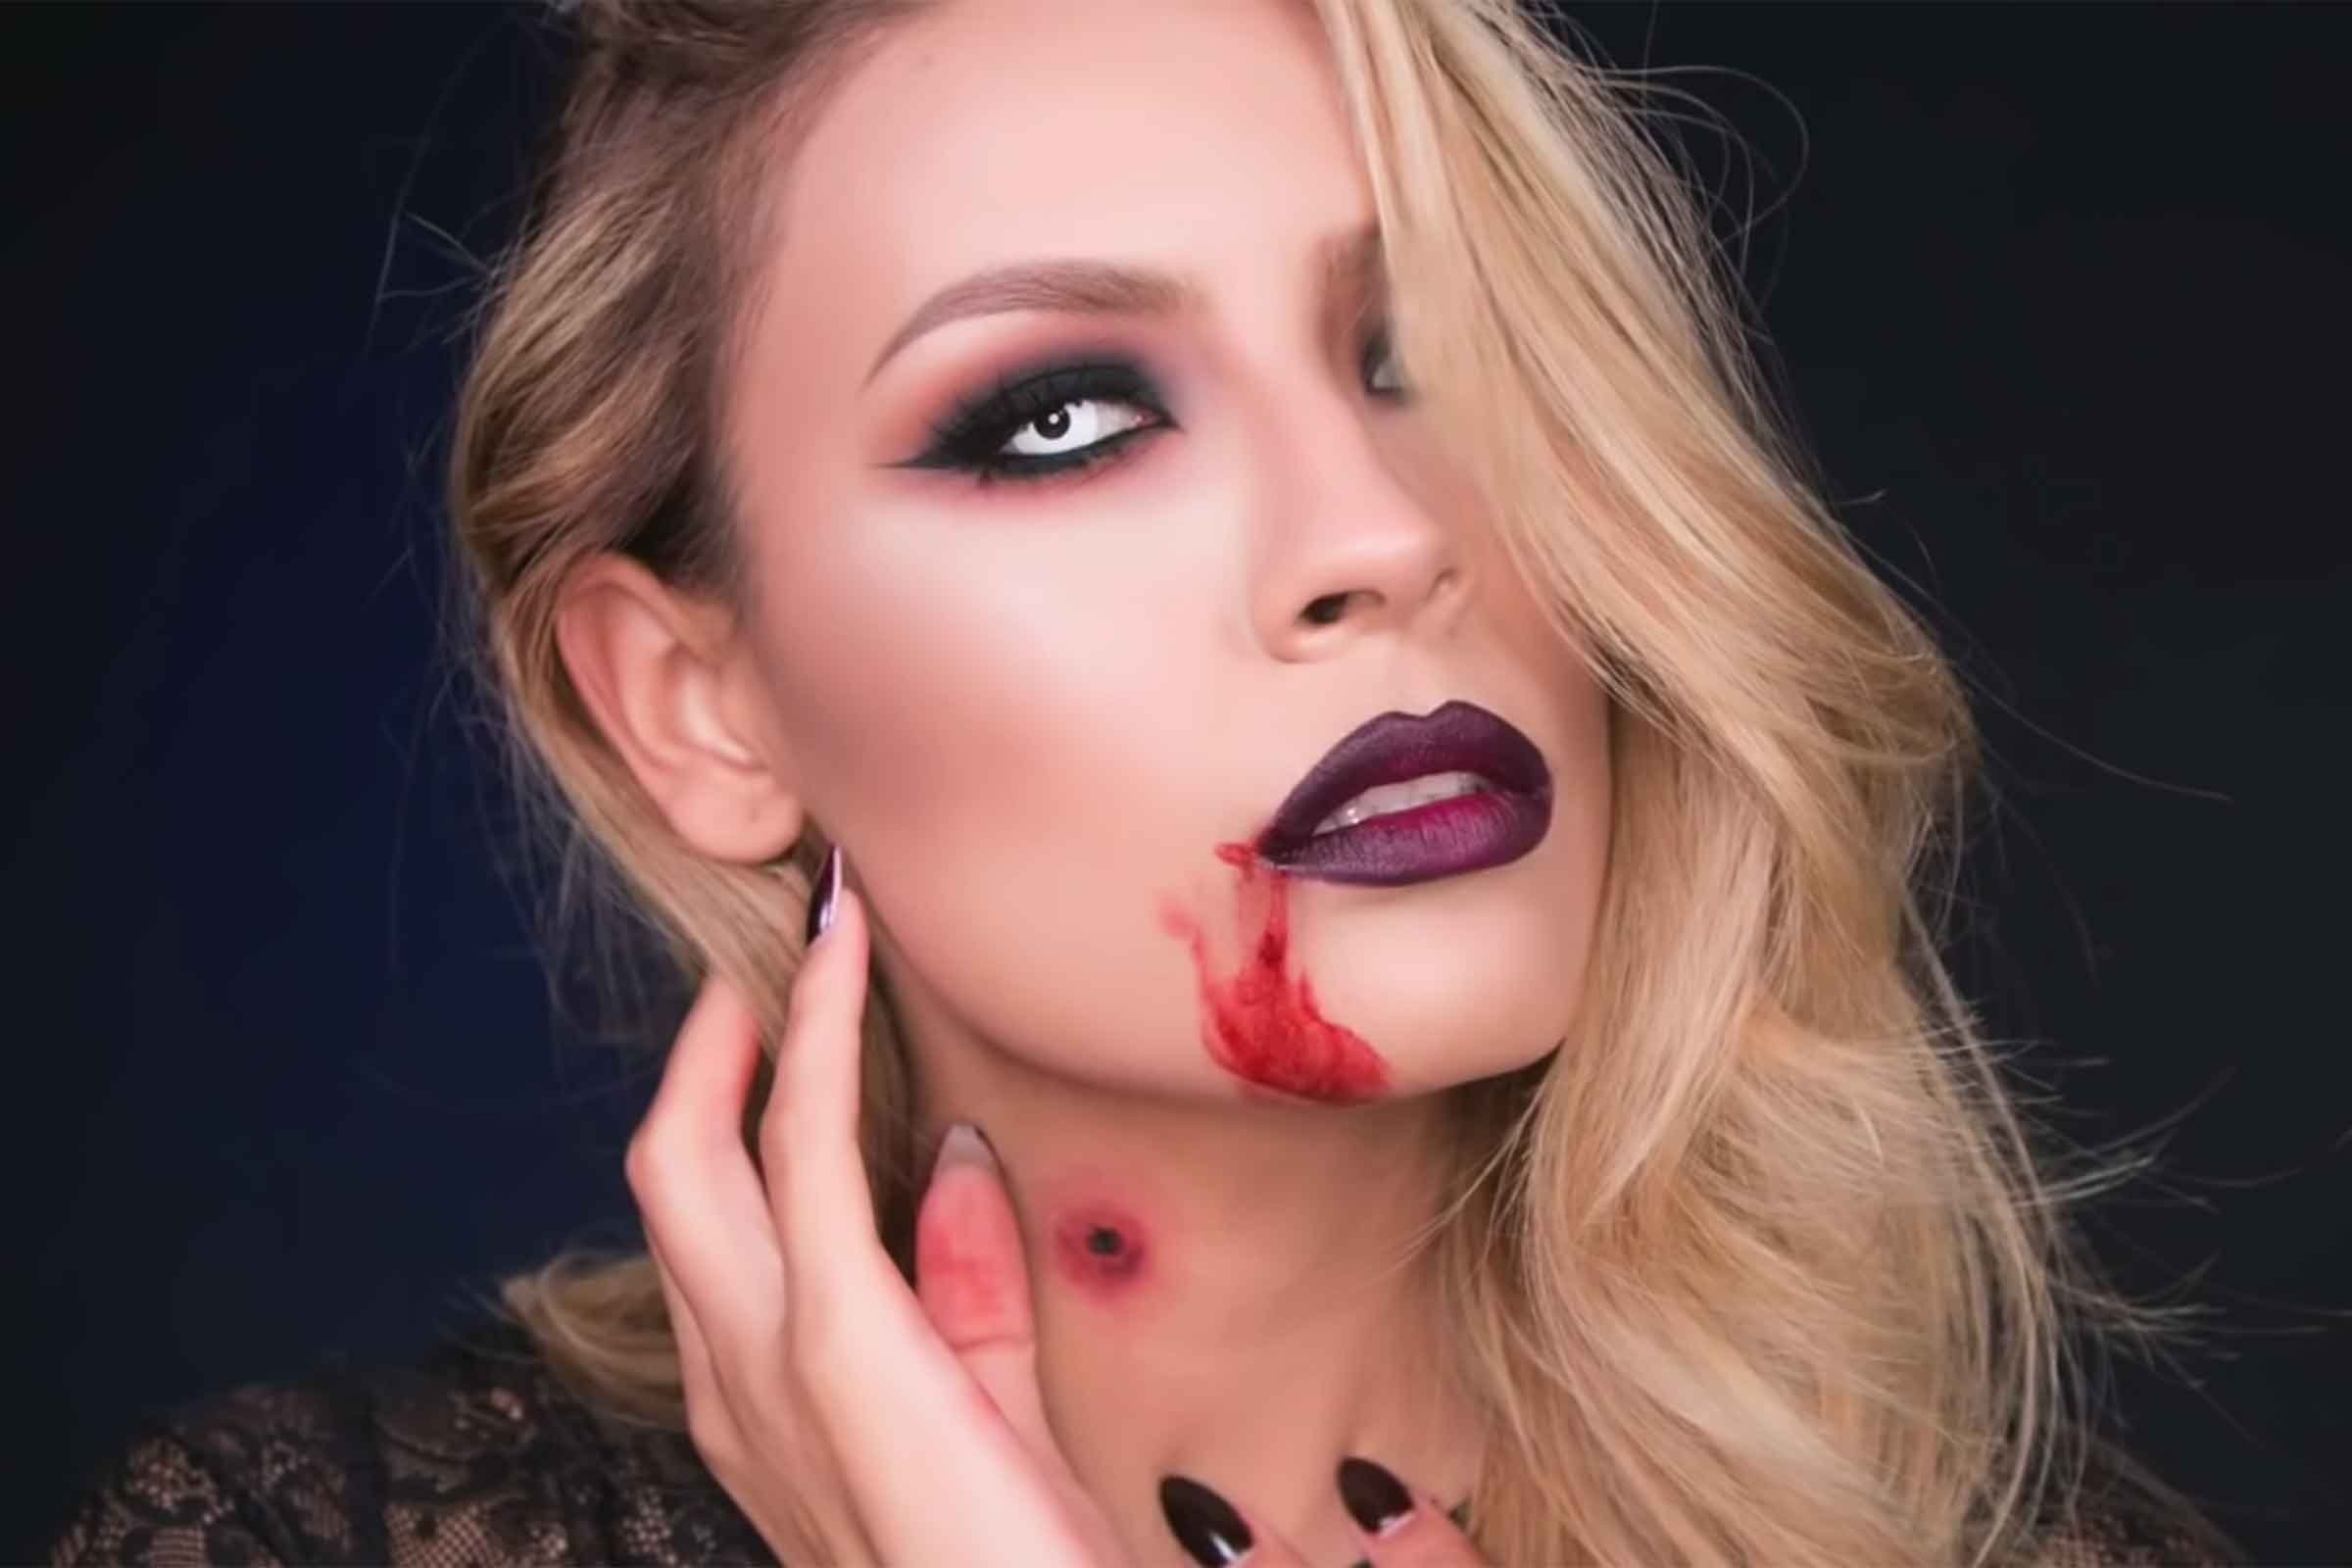 10 Cute Vampire Makeup Ideas For Kids easy halloween makeup ideas readers digest 1 2020